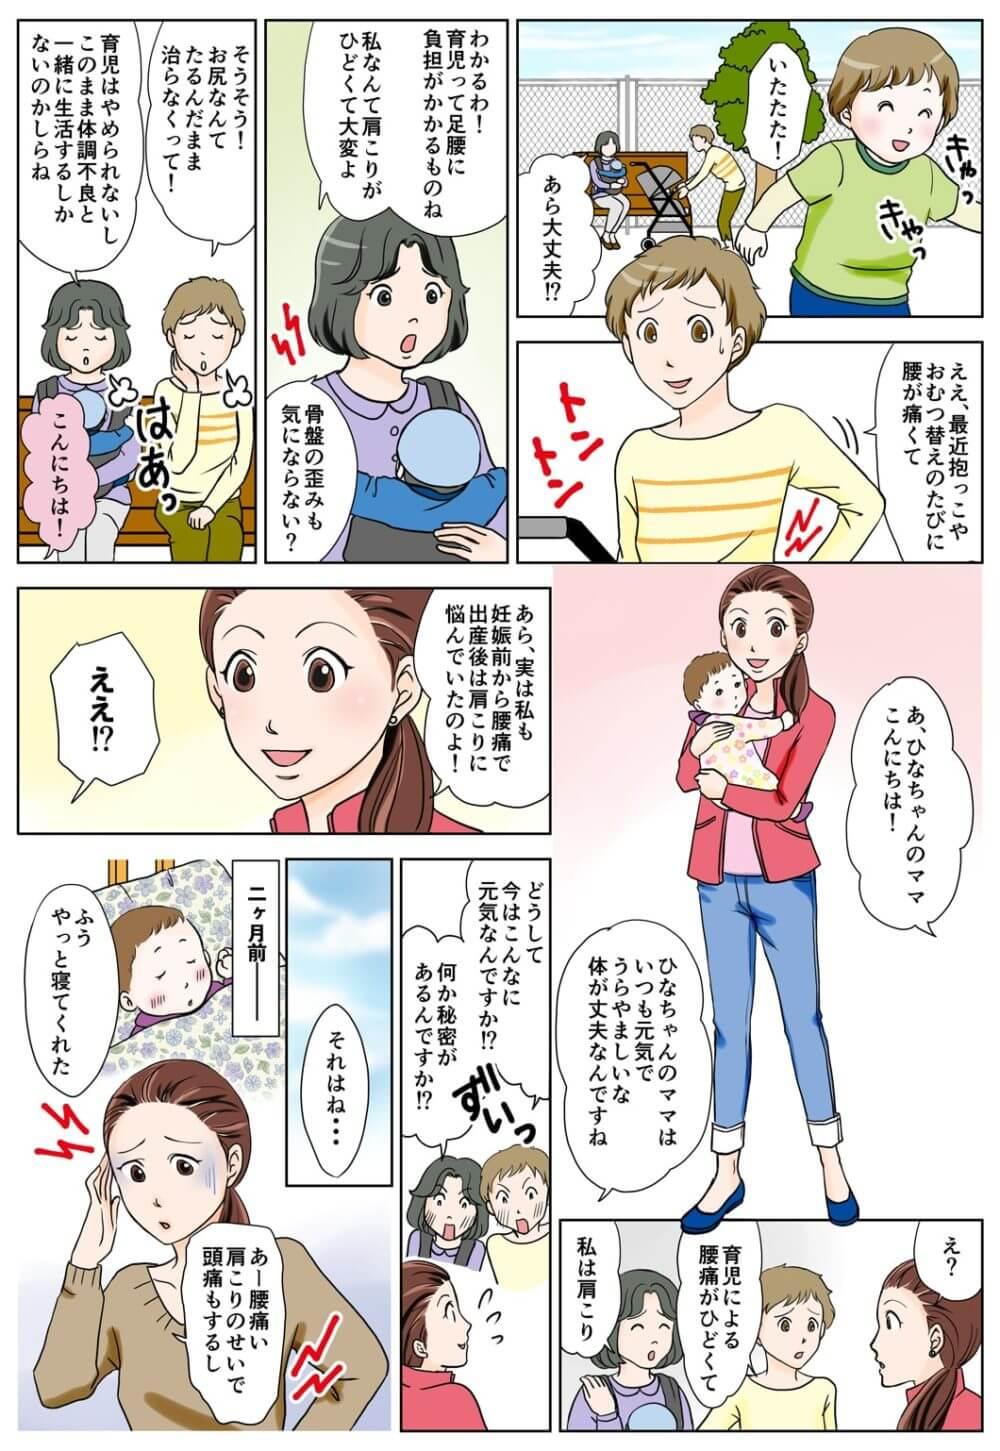 PCマンガページ1